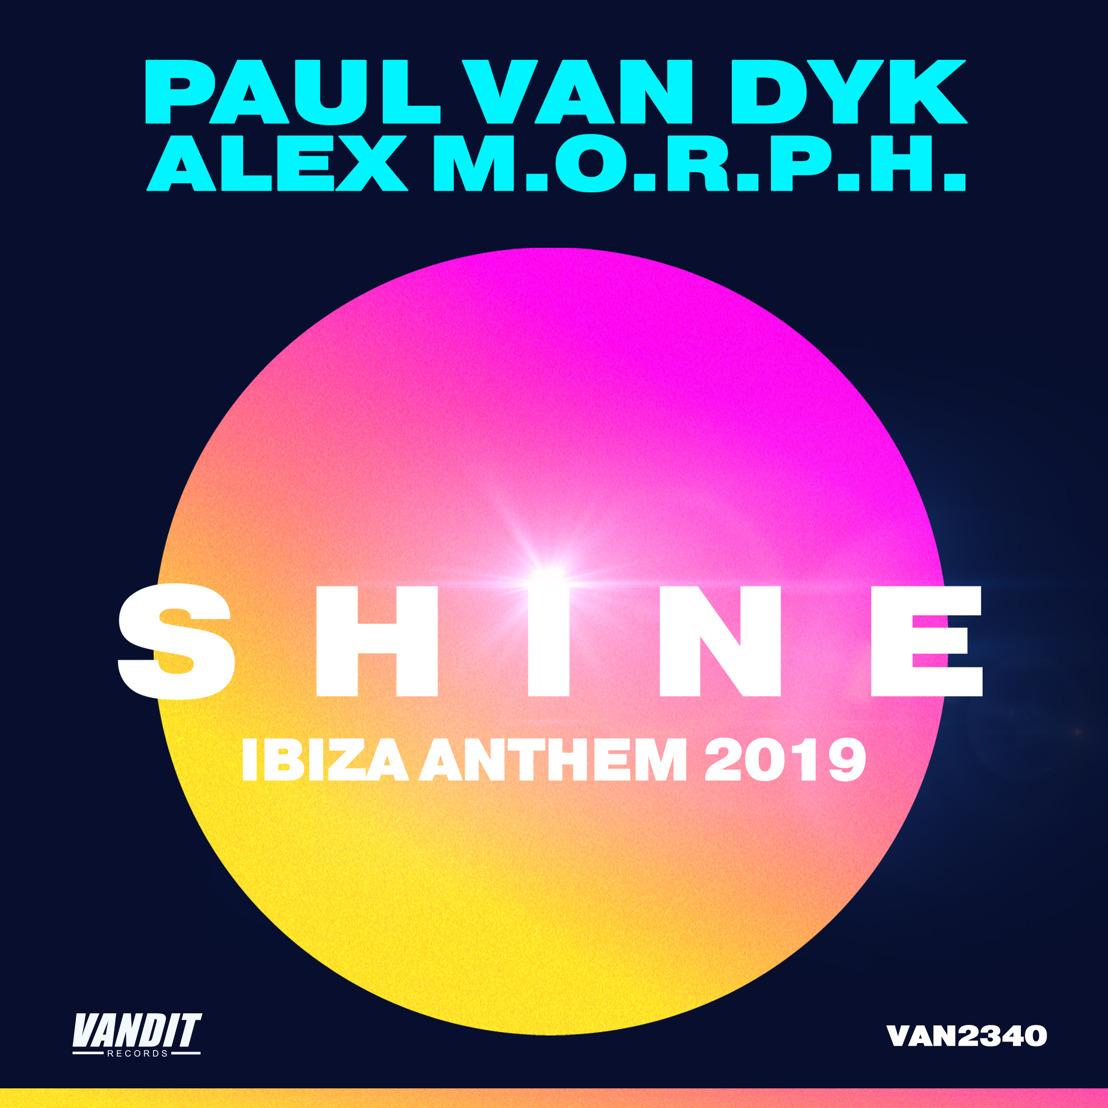 Paul van Dyk Releases SHINE Ibiza 2019 Anthem